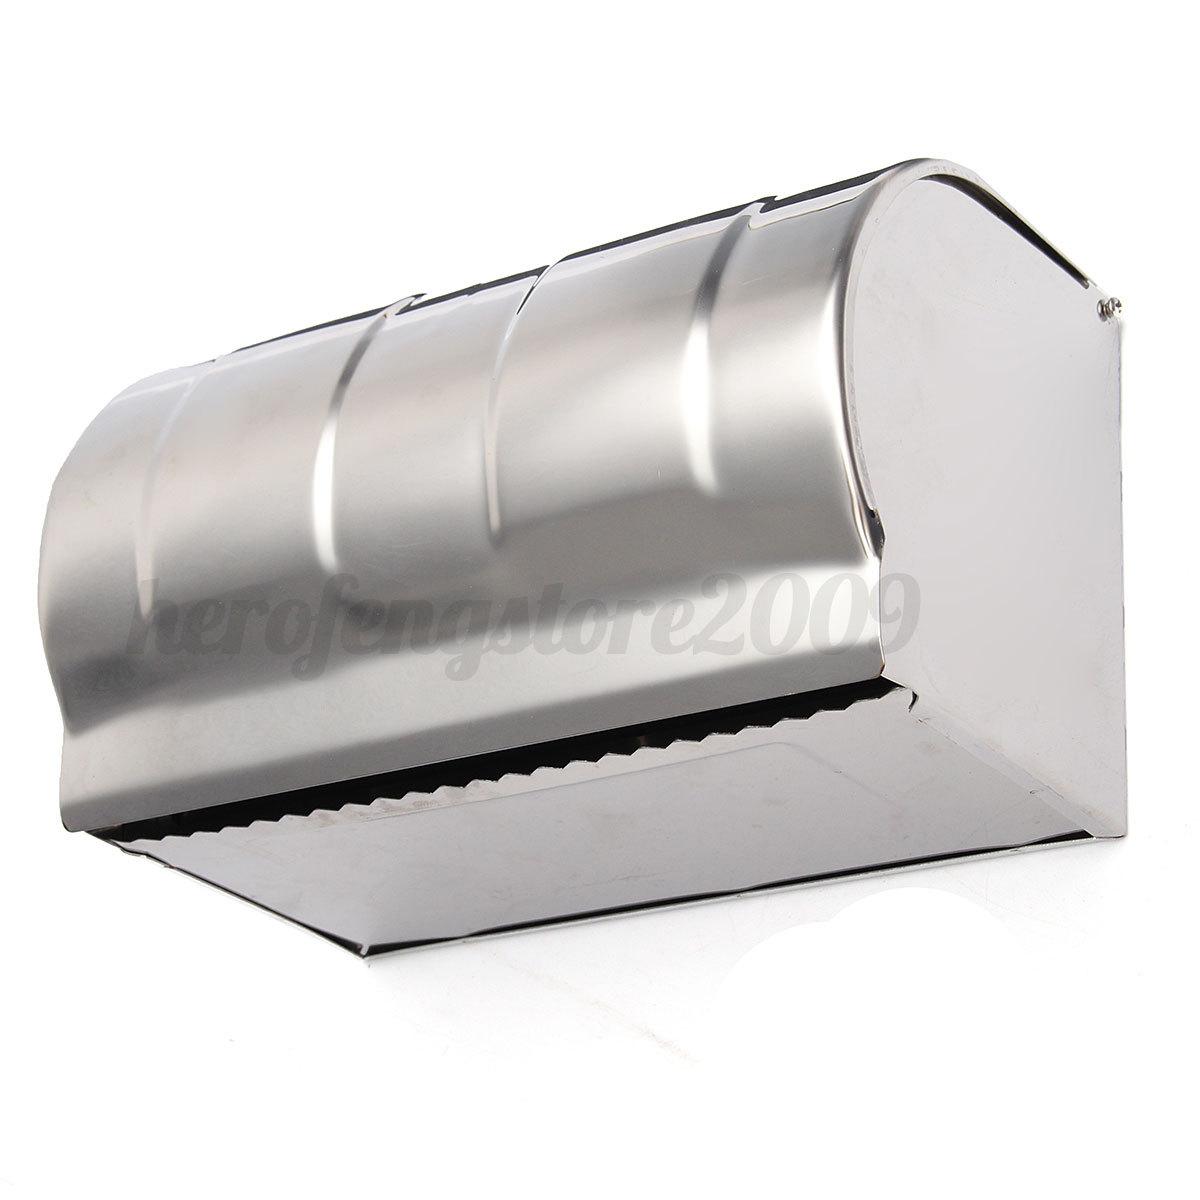 toilet roll bathroom tissue paper dispenser holder box wall mounted stainless ebay. Black Bedroom Furniture Sets. Home Design Ideas